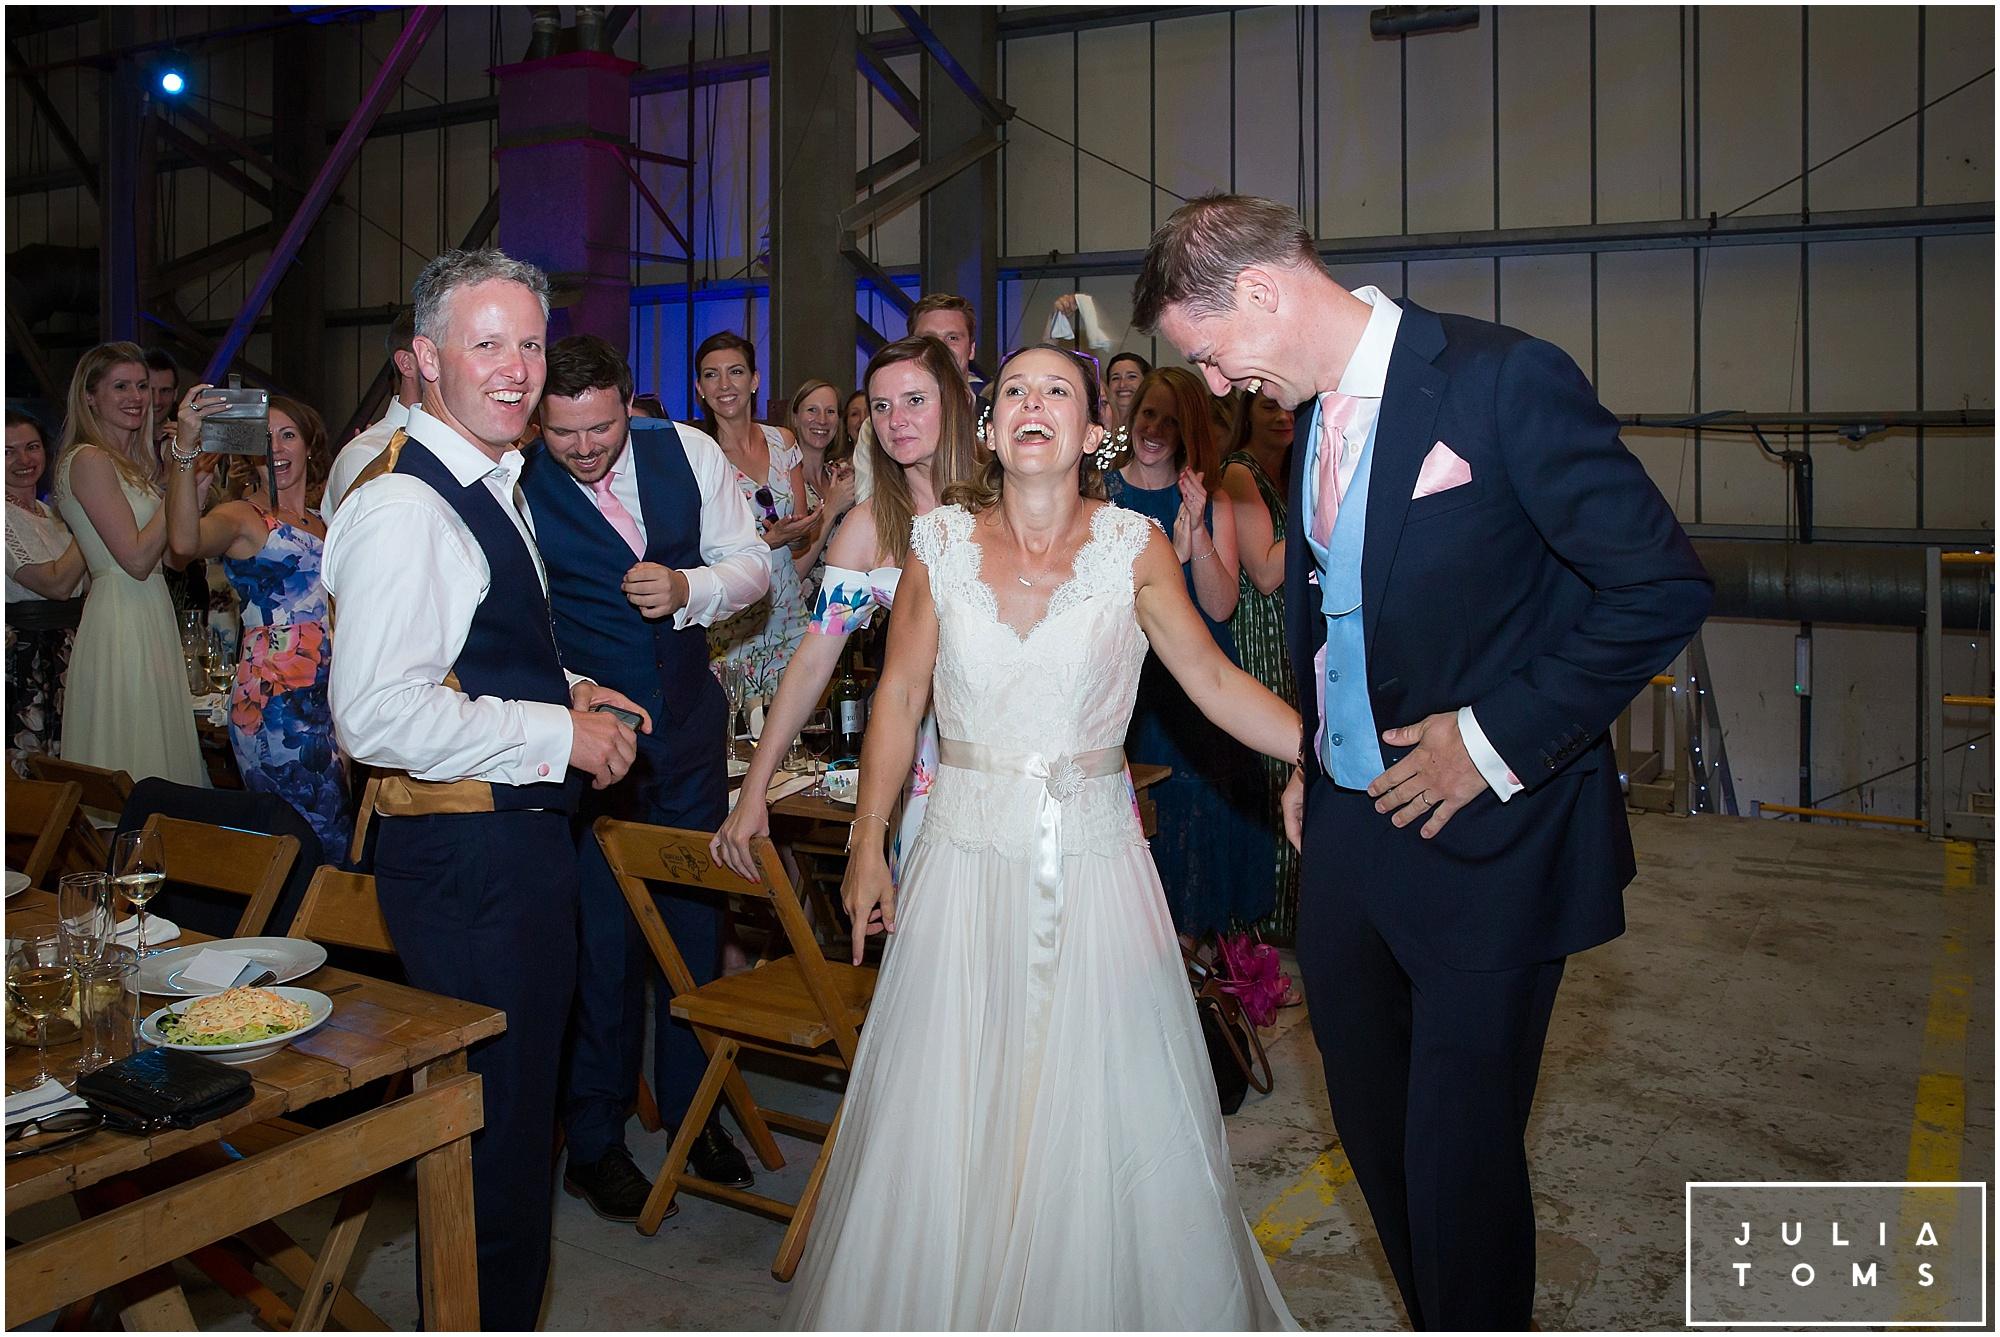 julia_toms_chichester_wedding_photographer_portsmouth_055.jpg